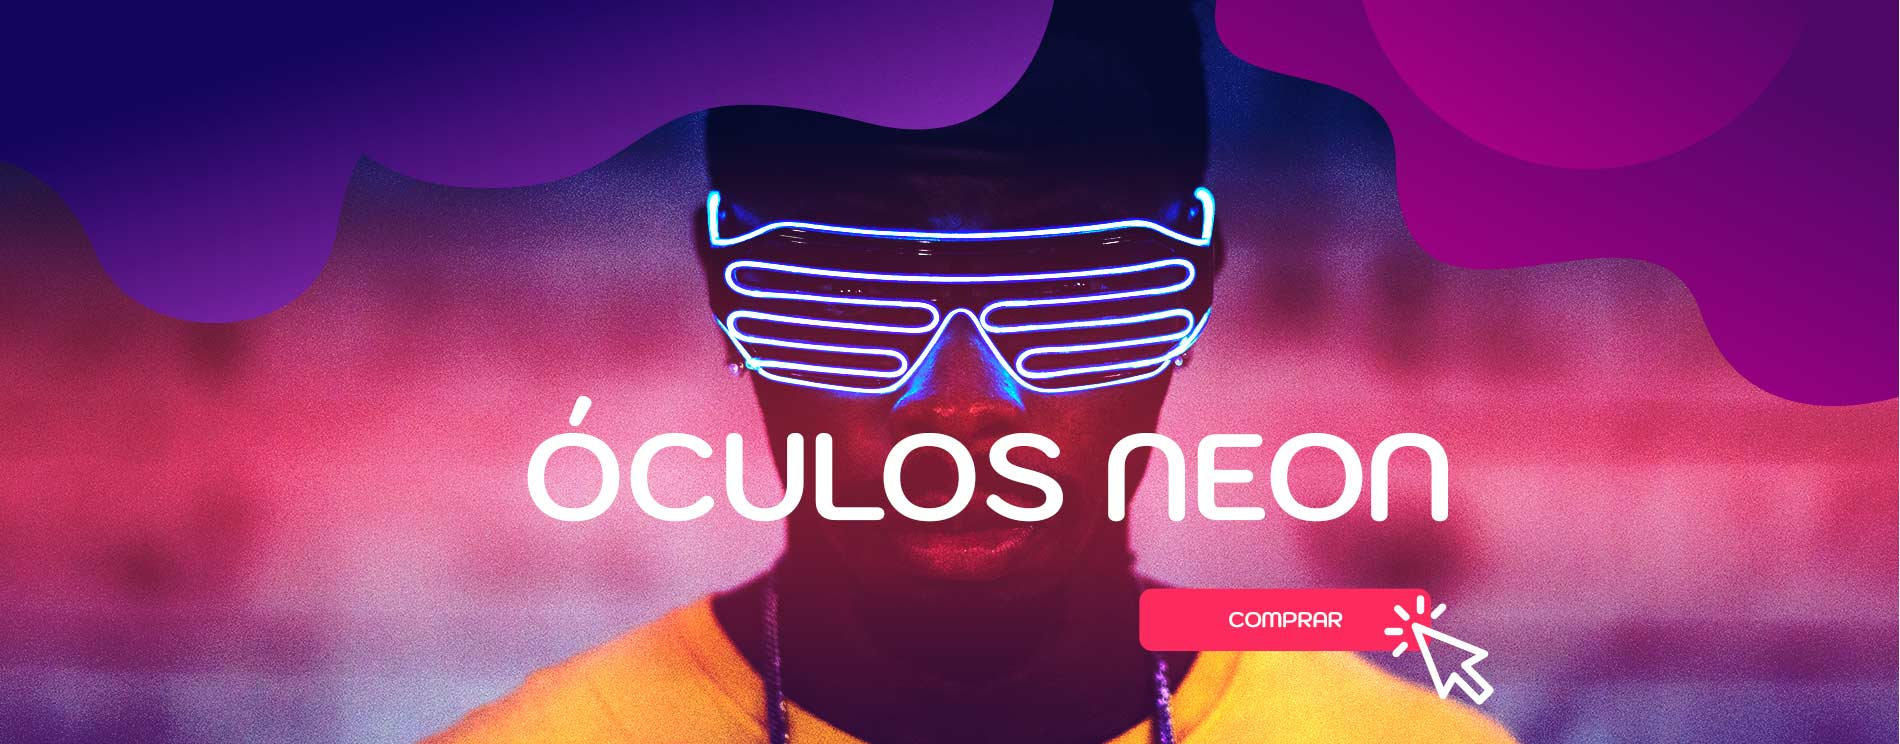 oculos-neon-led